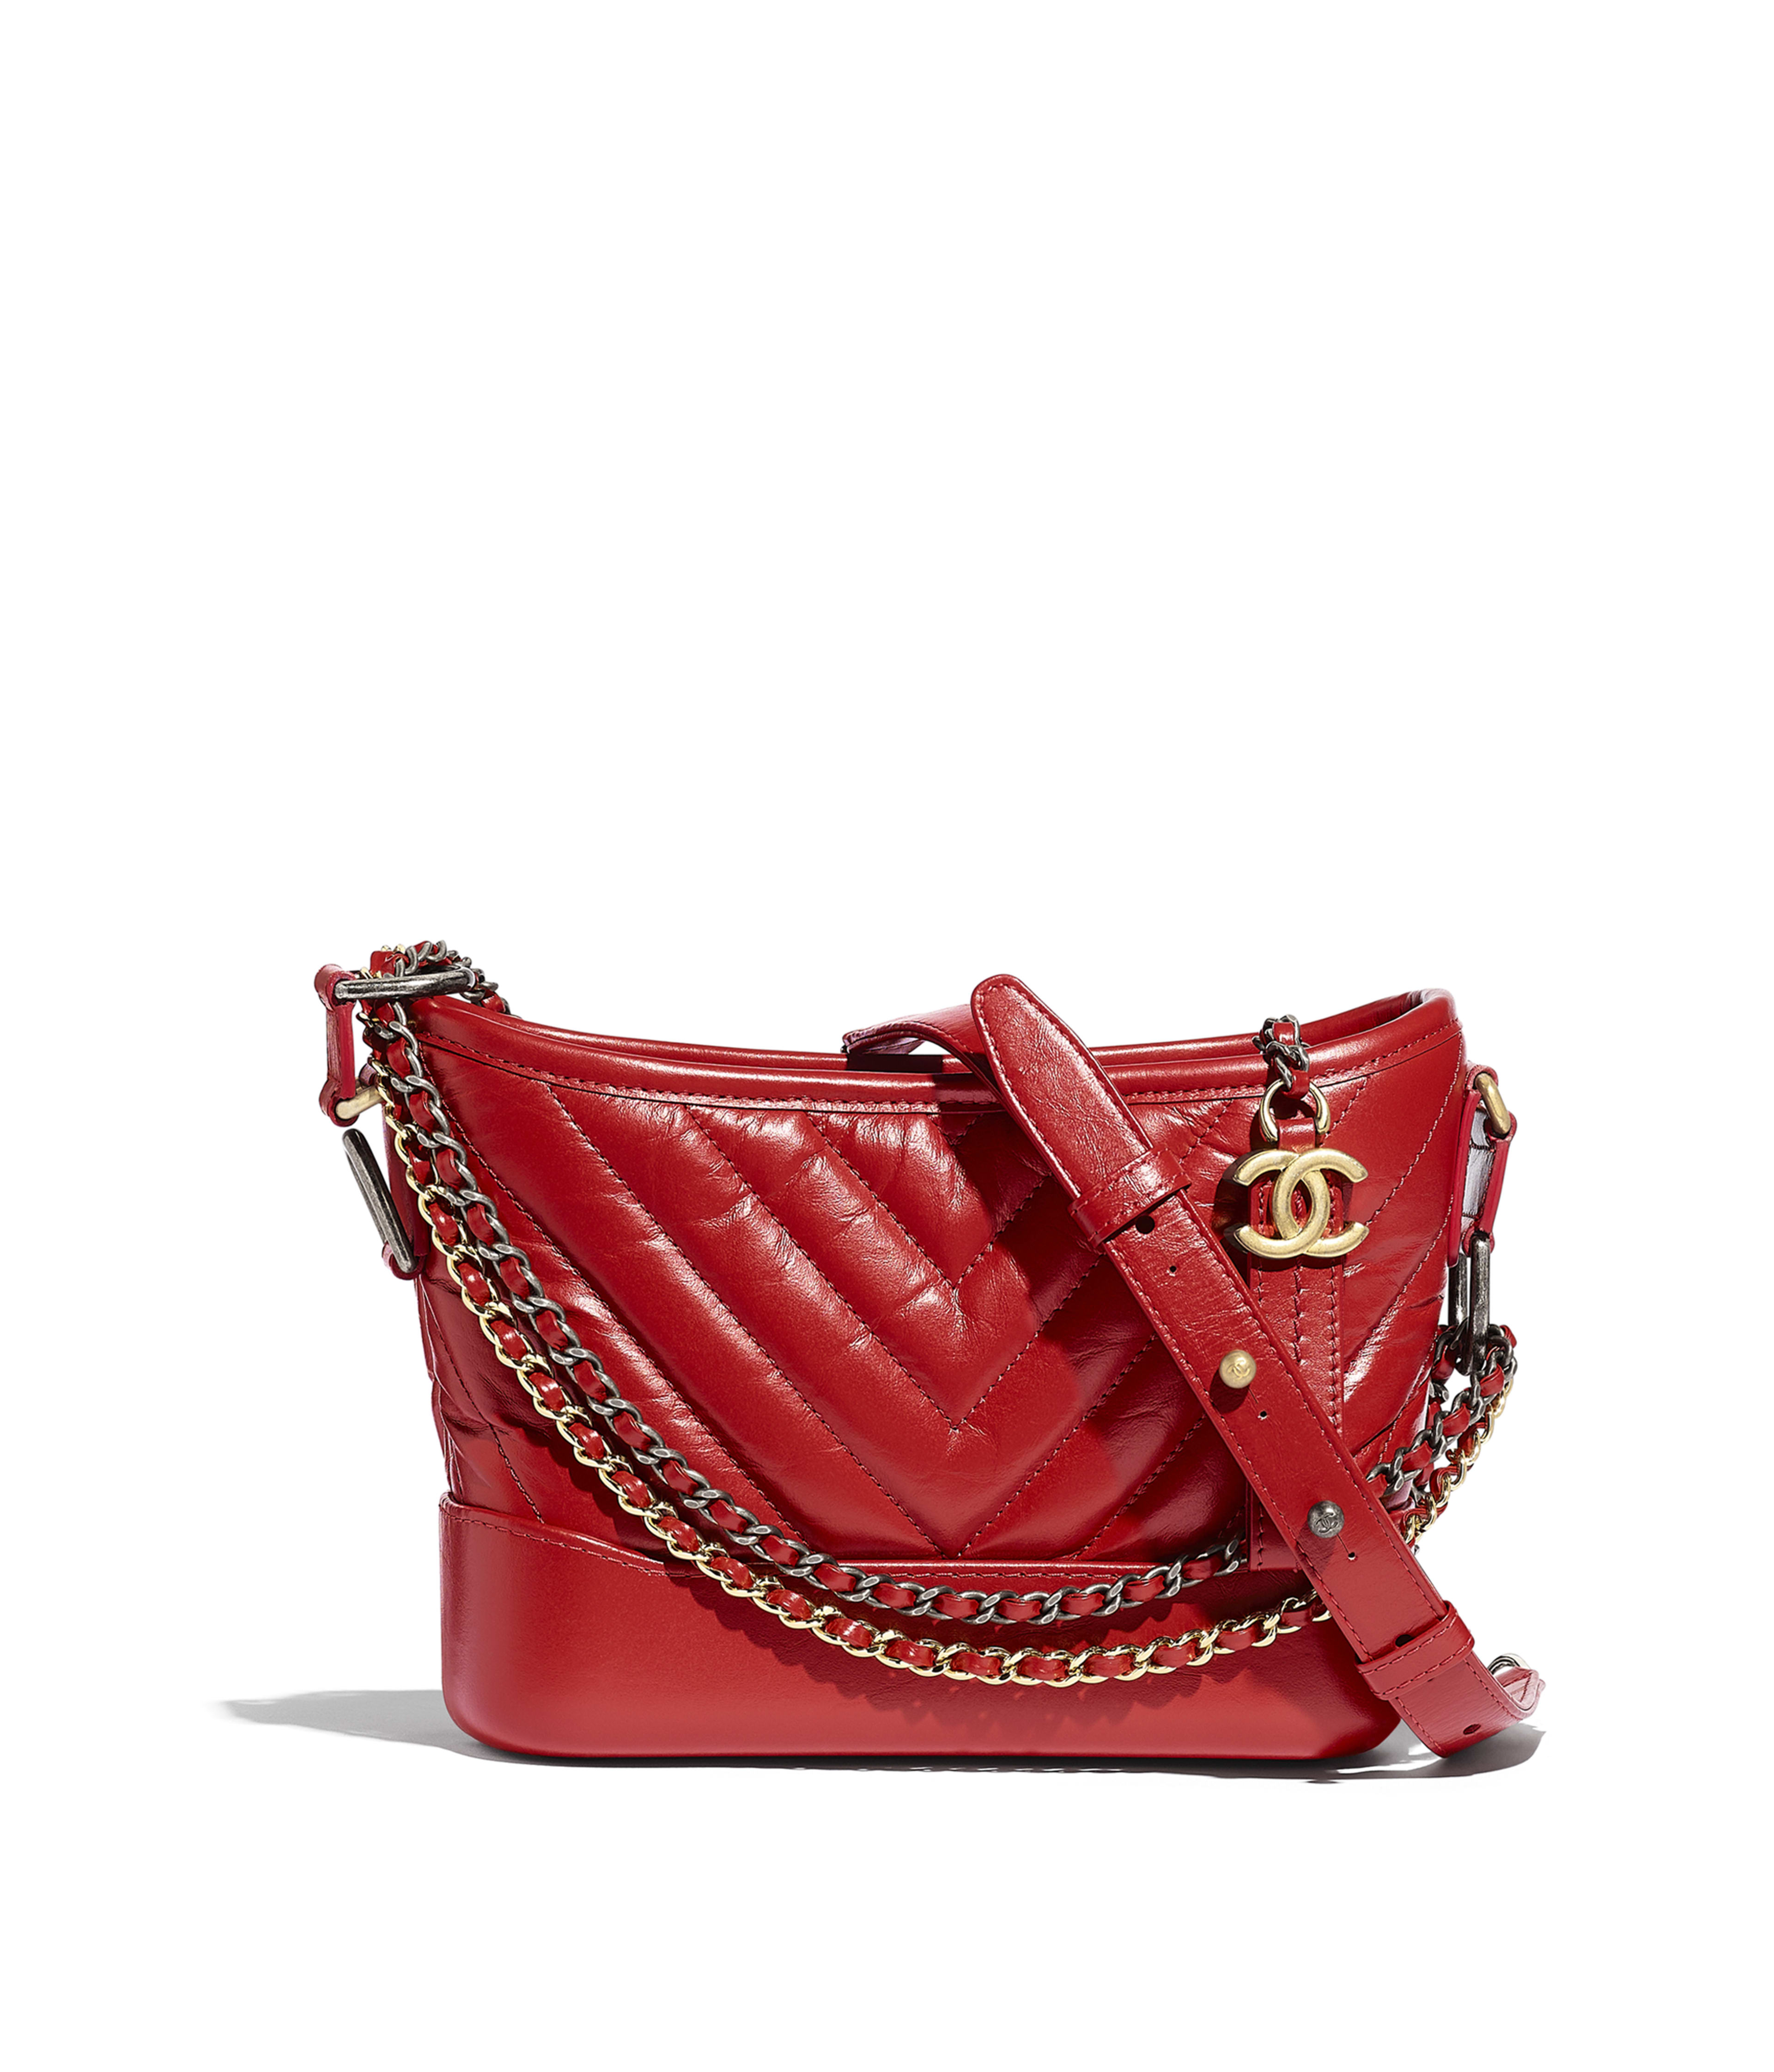 92dfaaa9e232 CHANEL'S GABRIELLE Small Hobo Bag Aged Calfskin, Smooth Calfskin, Gold-Tone  & Silver-Tone Metal, Dark Red Ref. A91810Y83824N0431